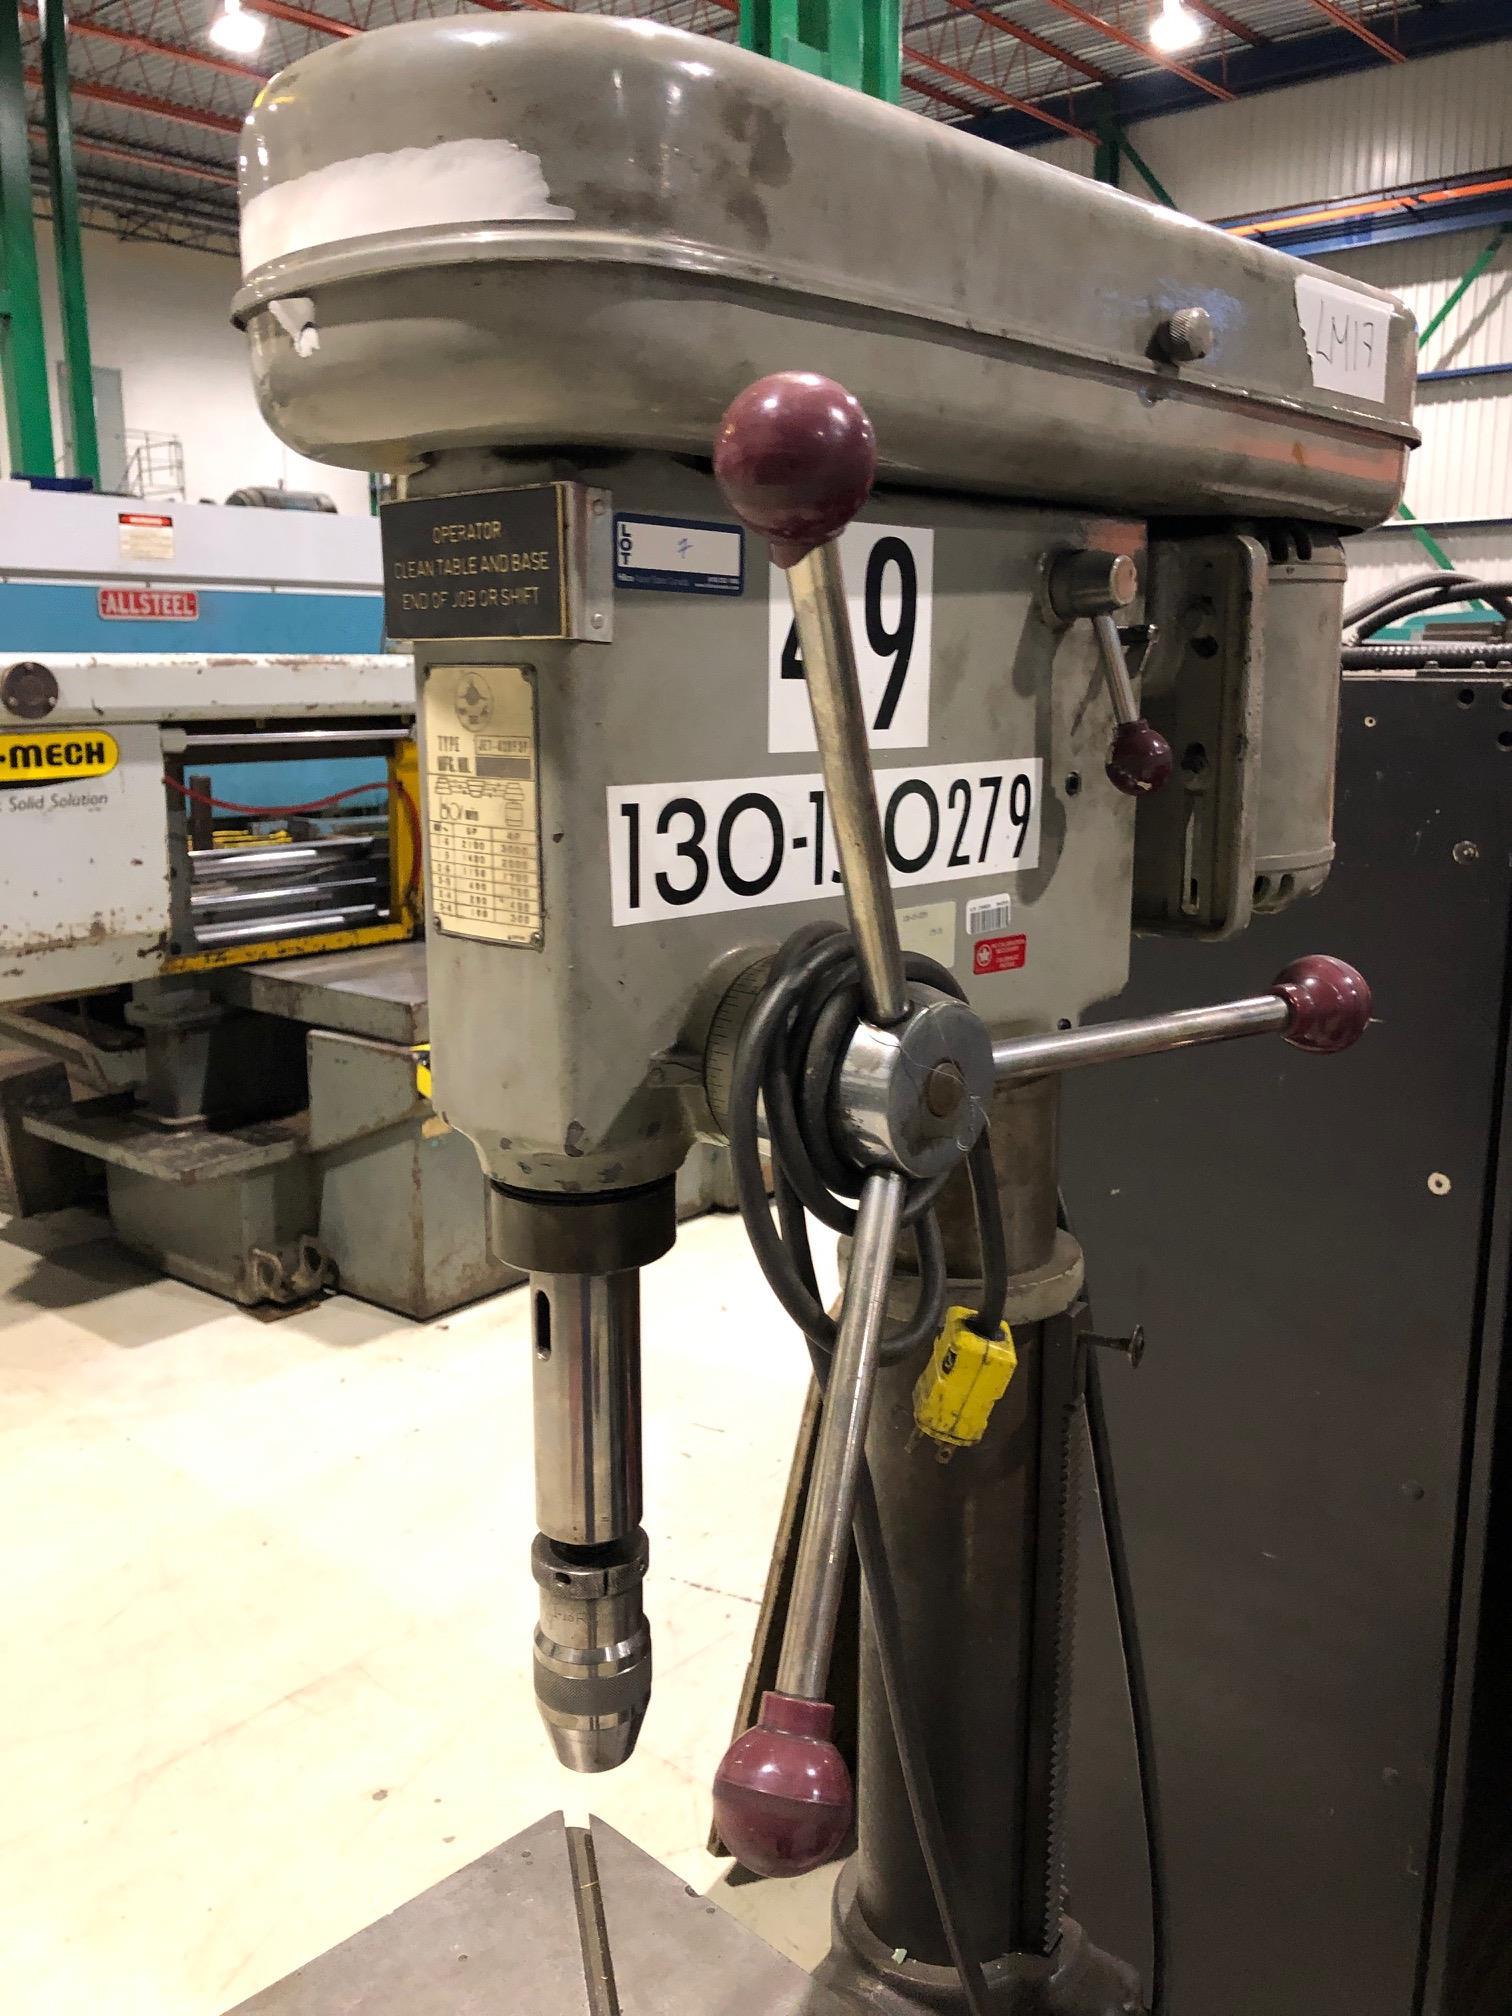 JET PEDESTAL DRILL MOD. 420F3P, 190-3000 RPM, 120V - Image 2 of 3